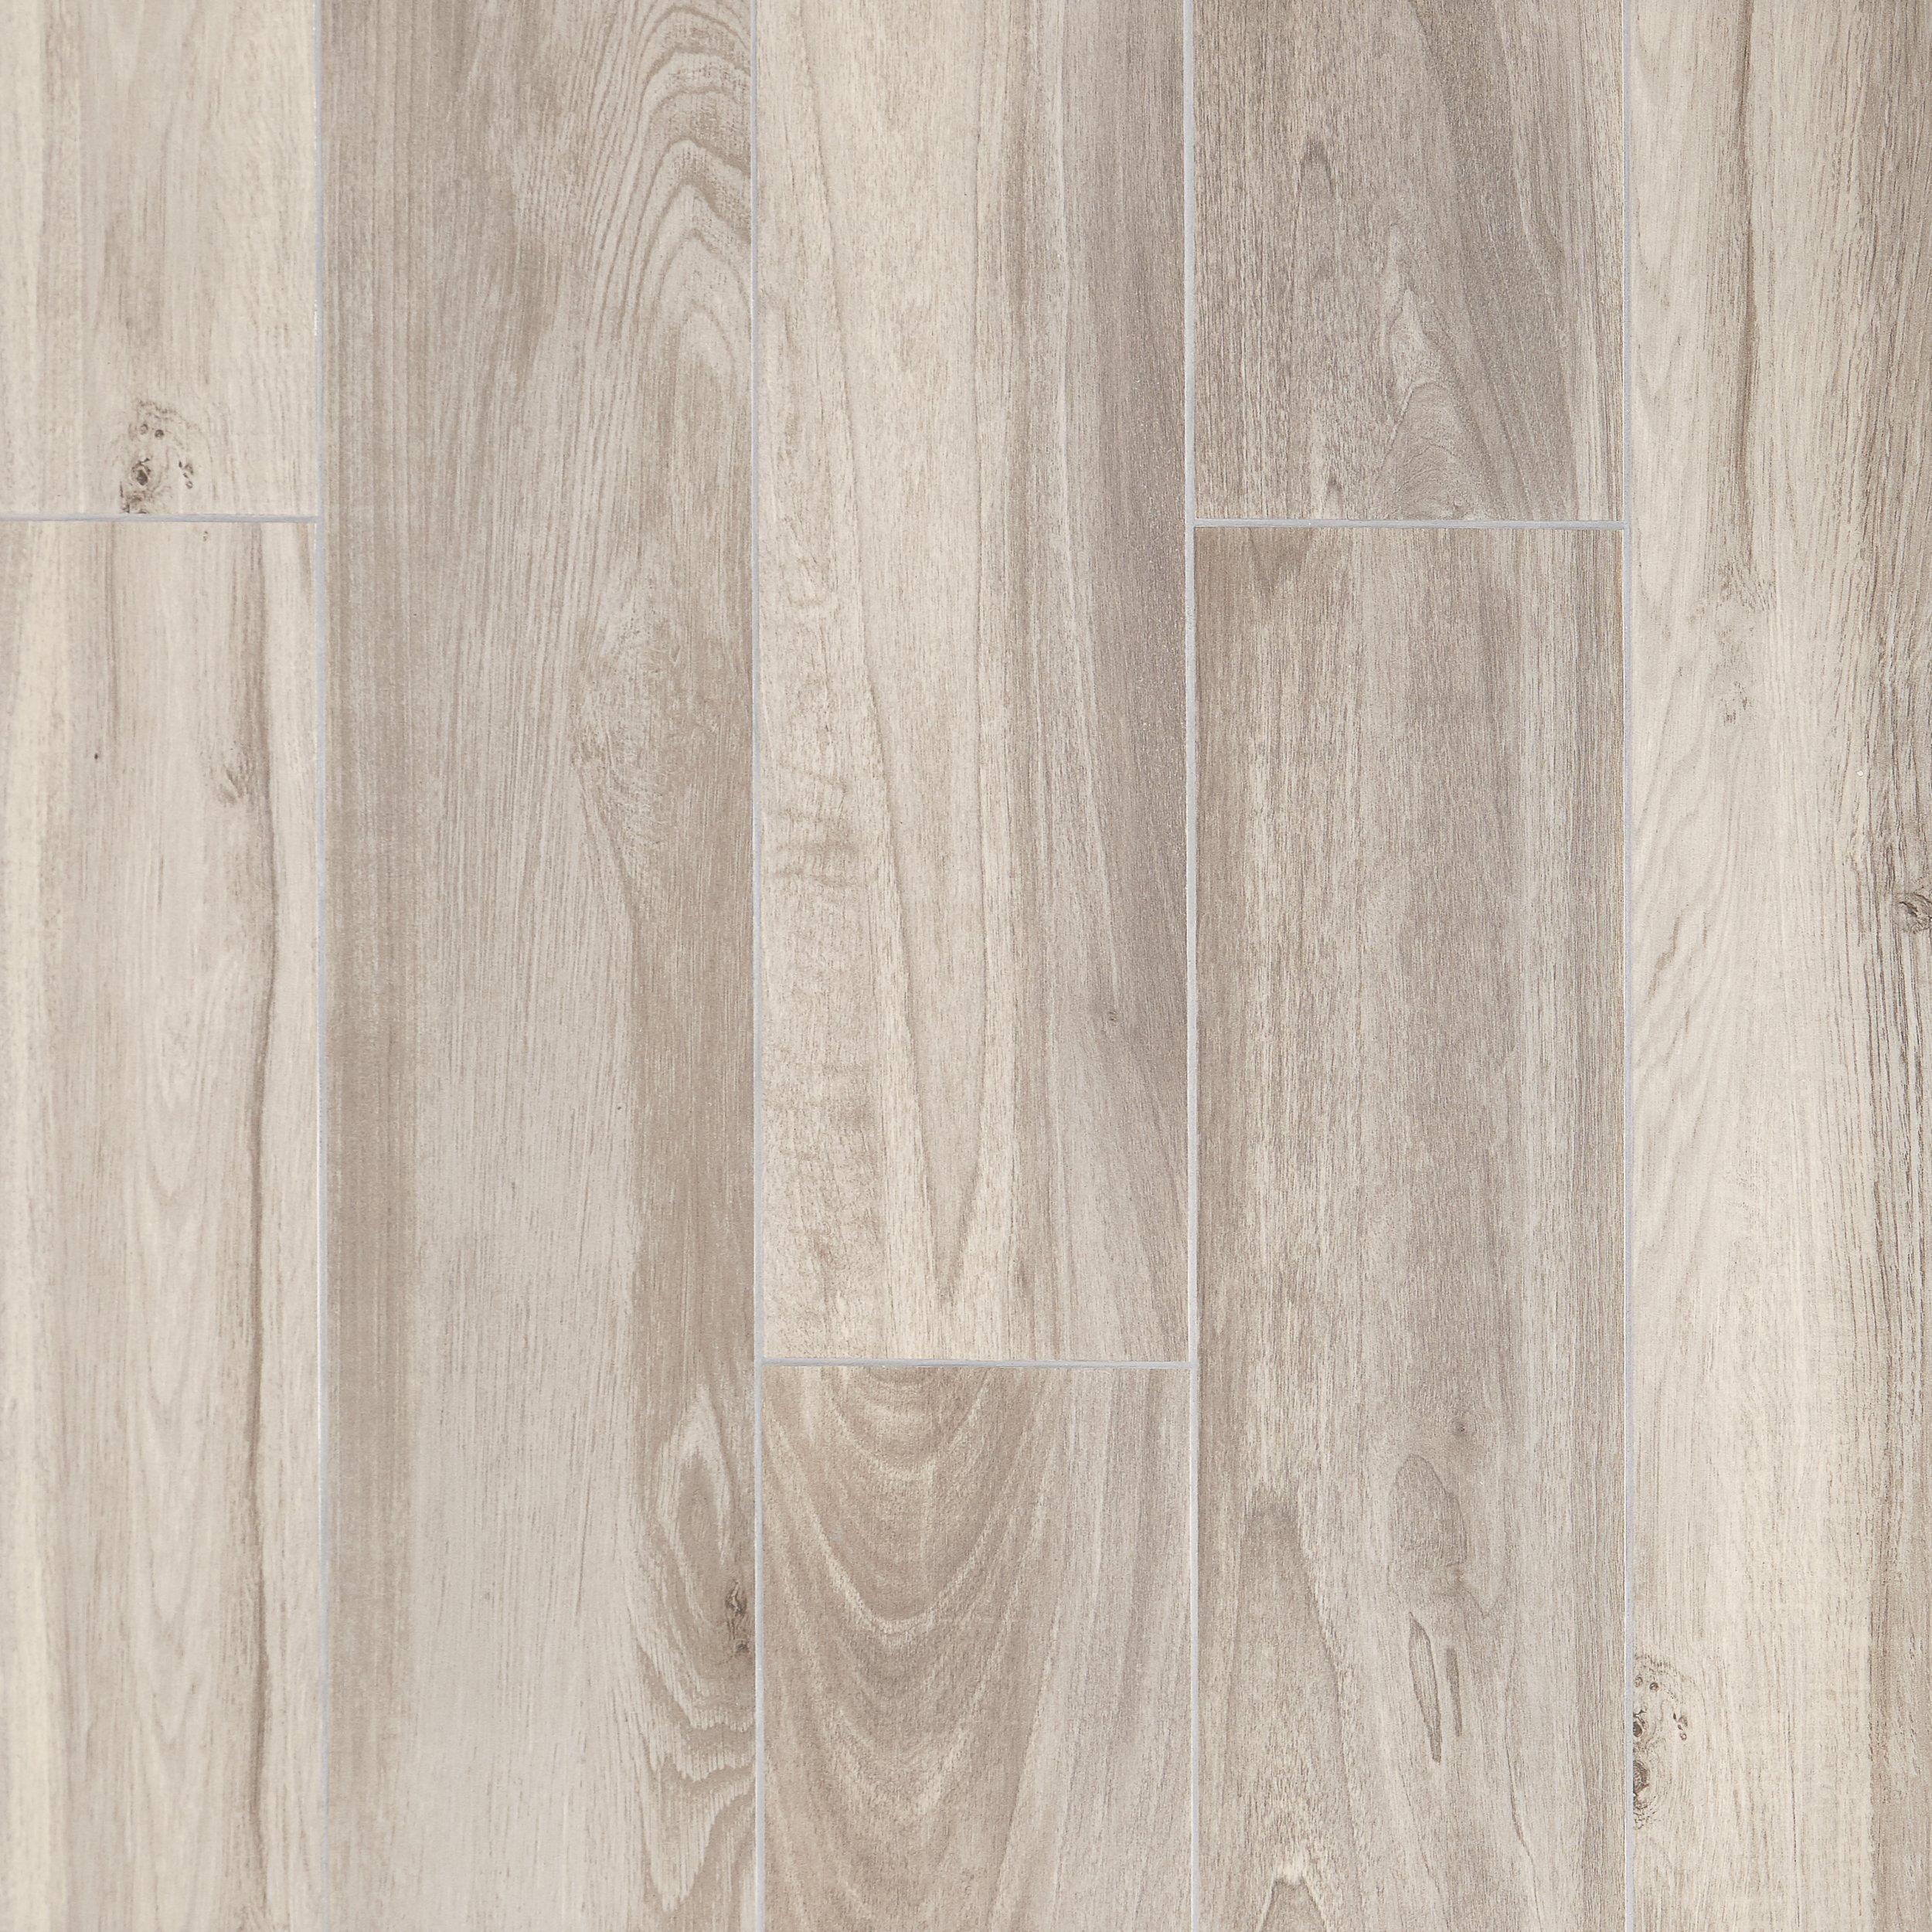 Highgate Light Wood Plank Porcelain Tile In 2020 Wood Look Tile Wood Look Tile Floor Porcelain Wood Tile